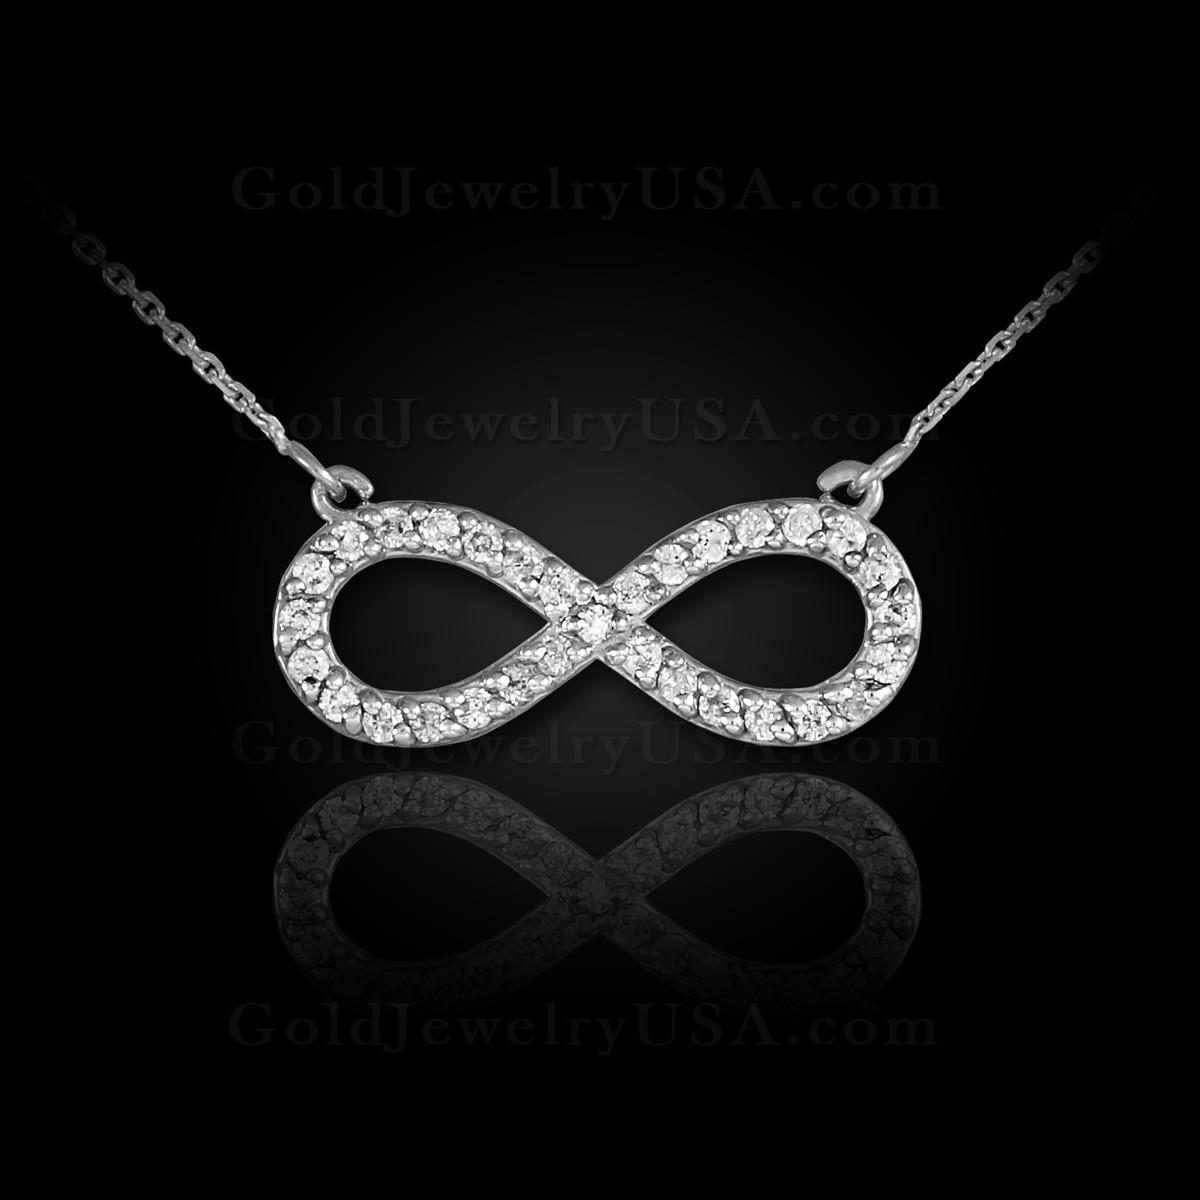 54642de8e825 14K White Gold Diamond Infinity Necklace